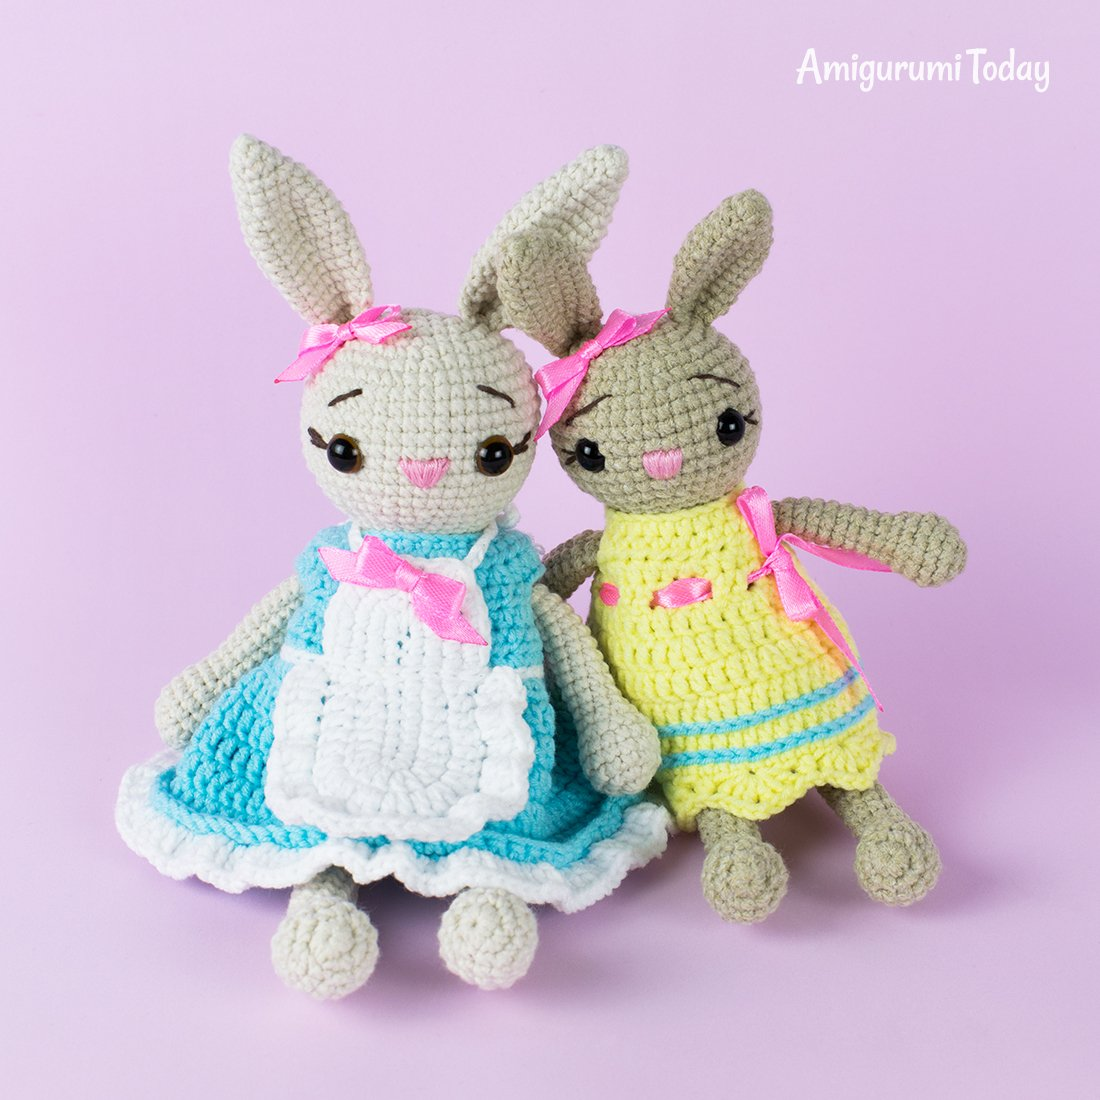 Tiny fox amigurumi pattern   Crochet bunny pattern, Amigurumi pattern   1100x1100